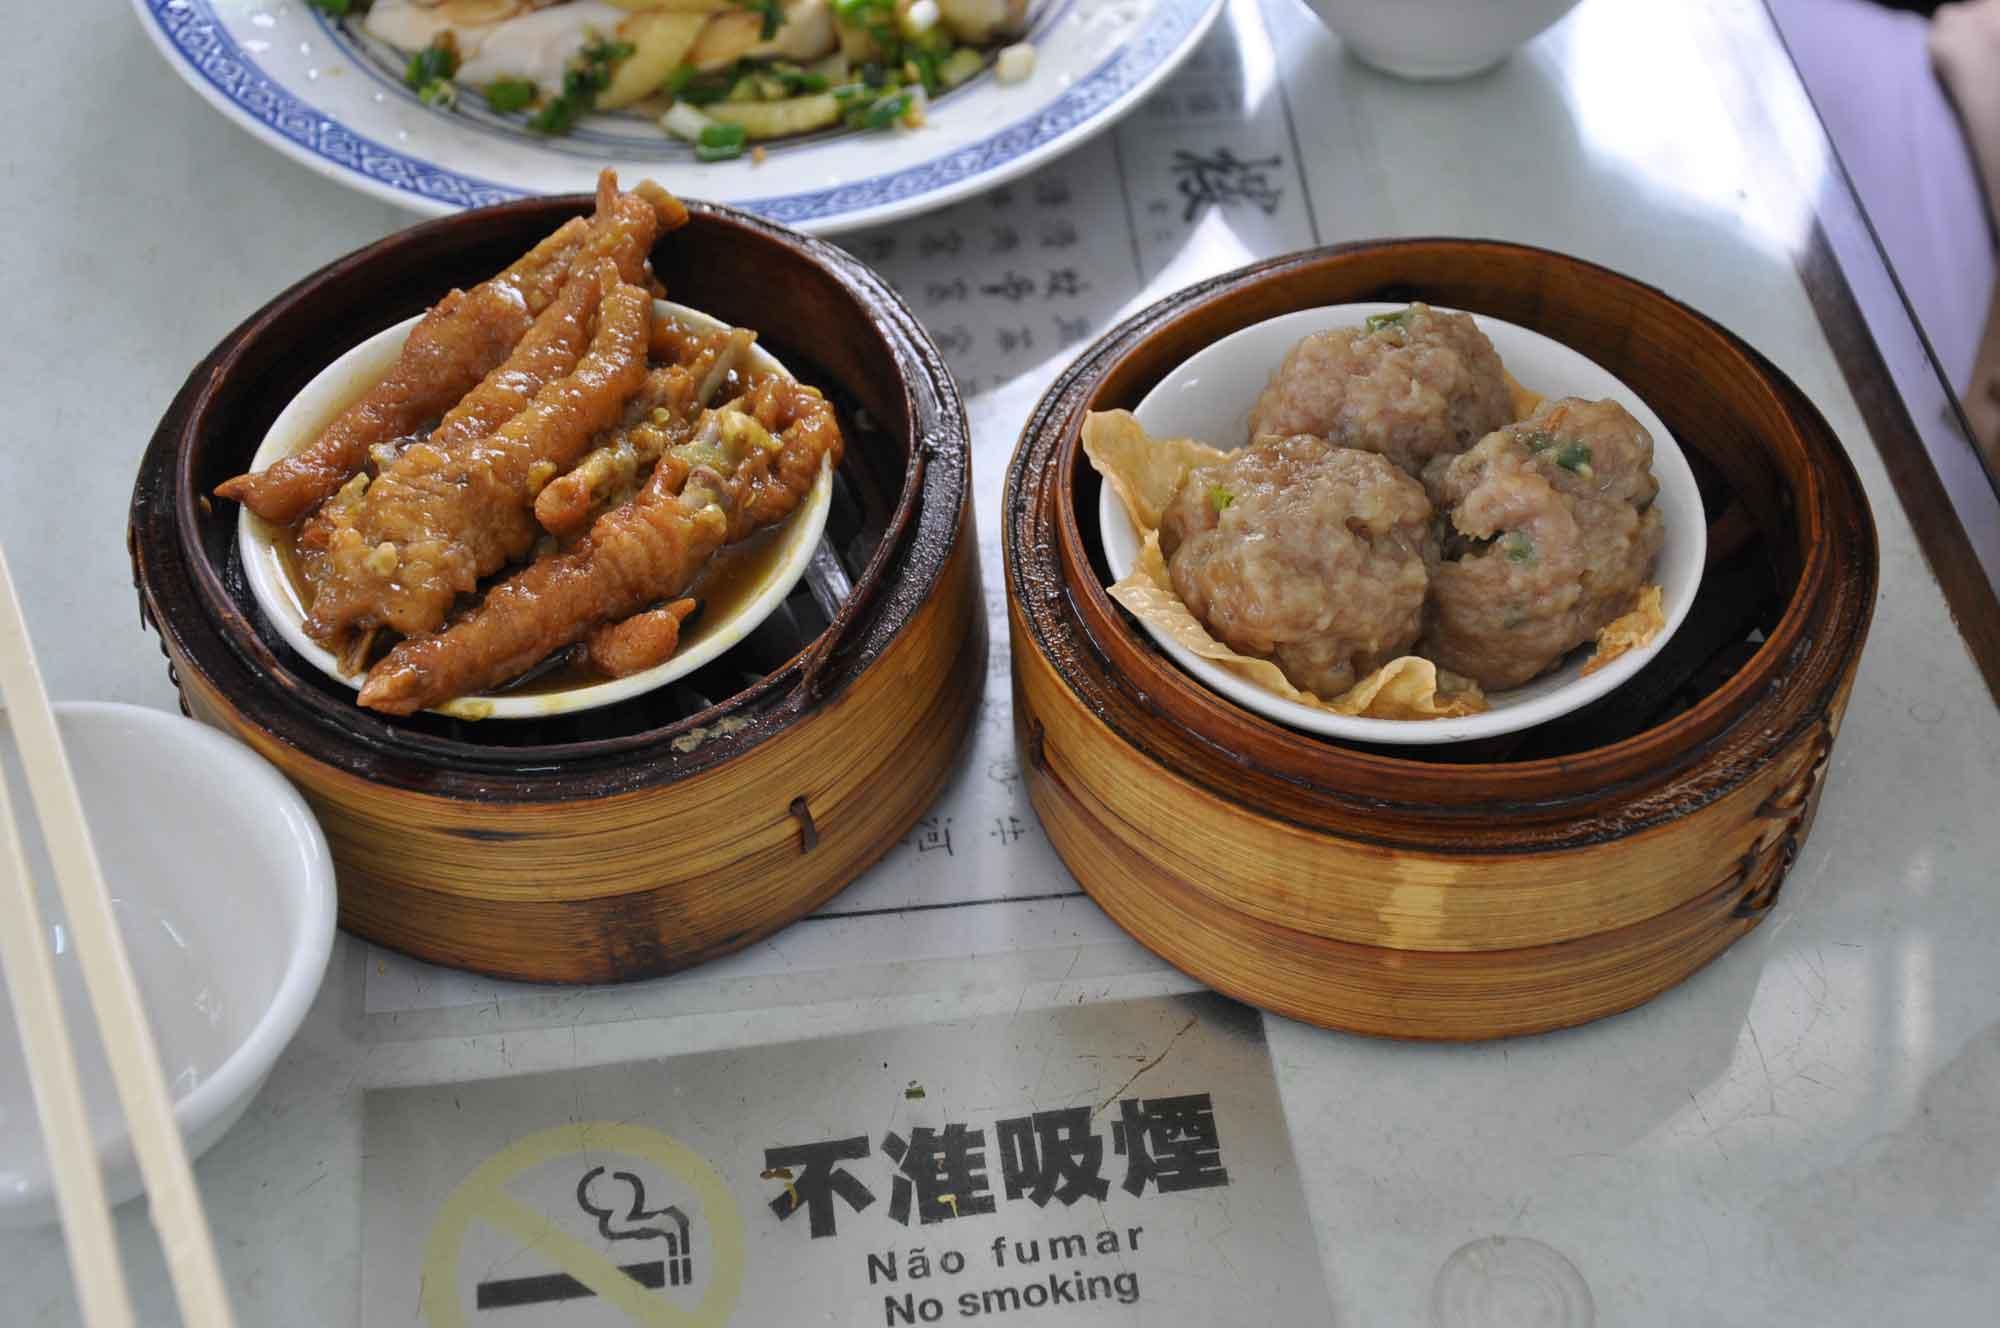 Long Wa Teahouse Steamed Pork Ribs and Chicken Feet